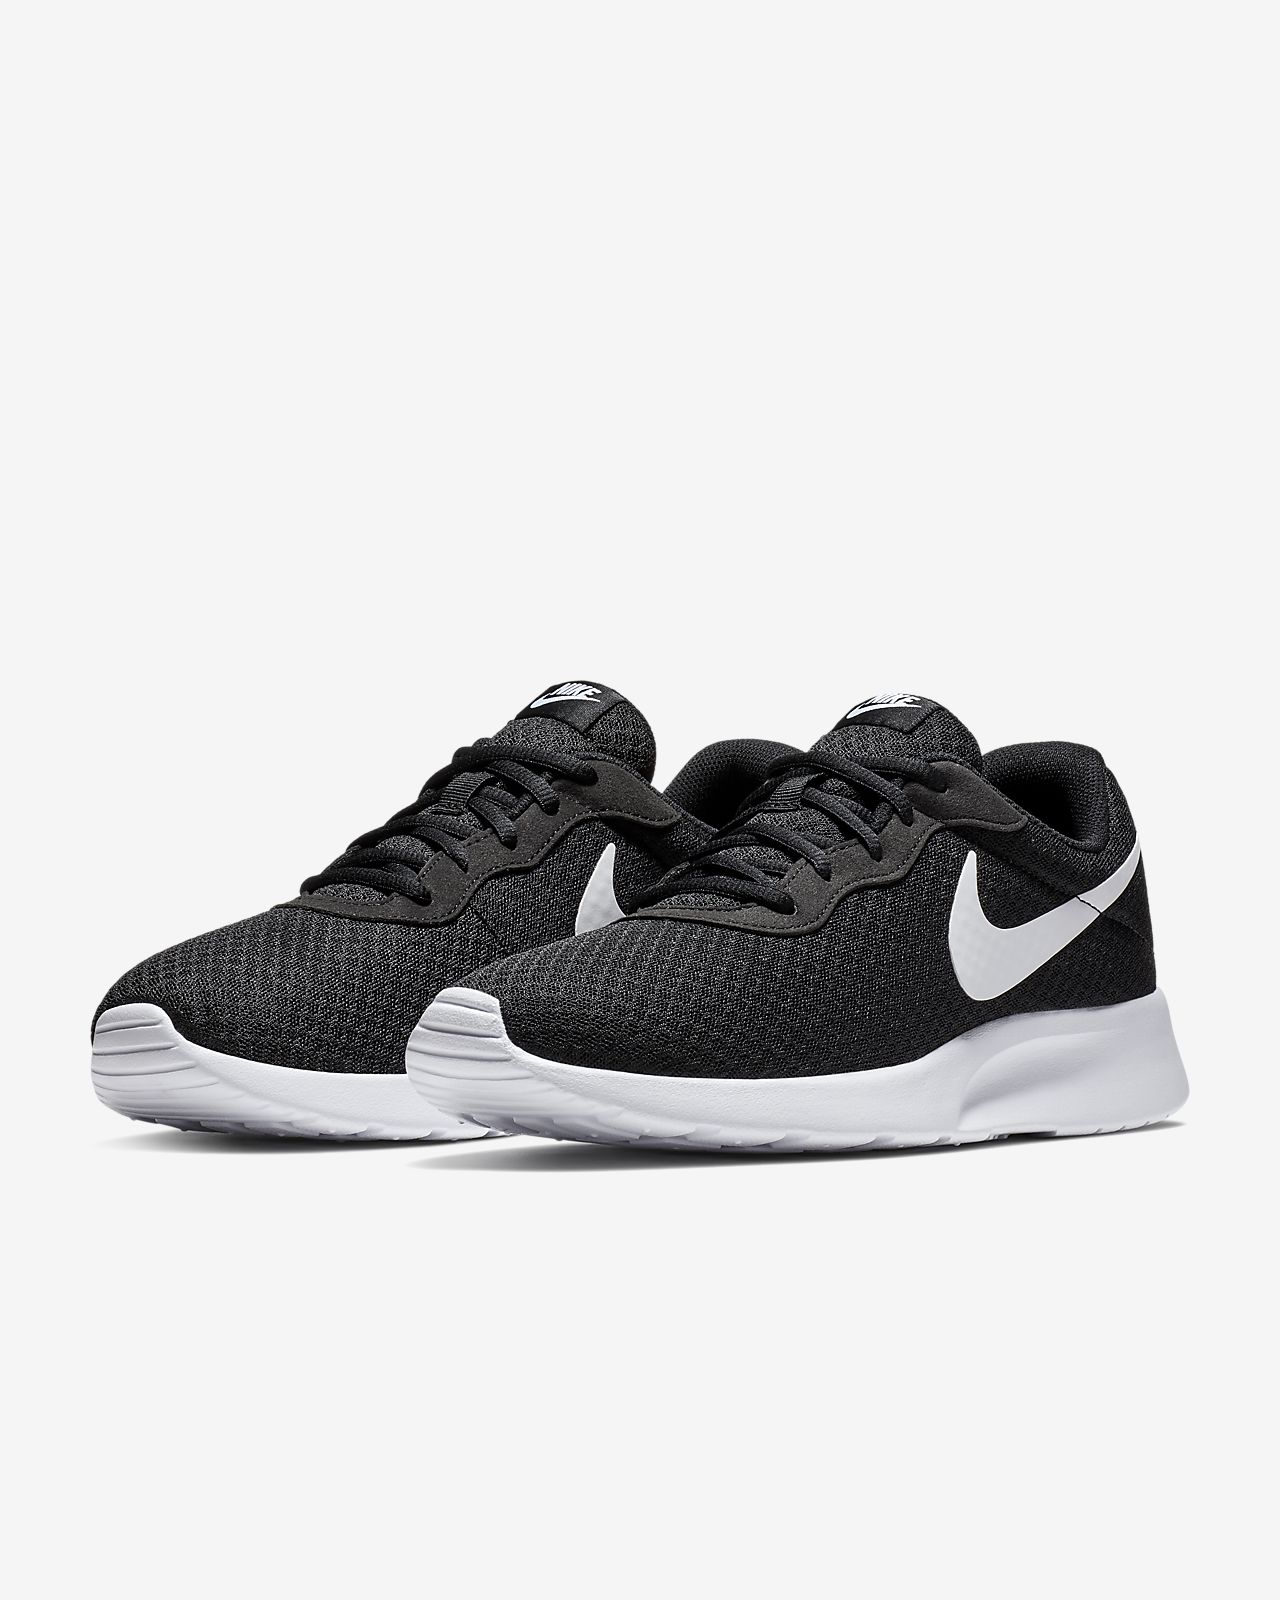 e95507a16a2 Low Resolution Ανδρικό παπούτσι Nike Tanjun Ανδρικό παπούτσι Nike Tanjun